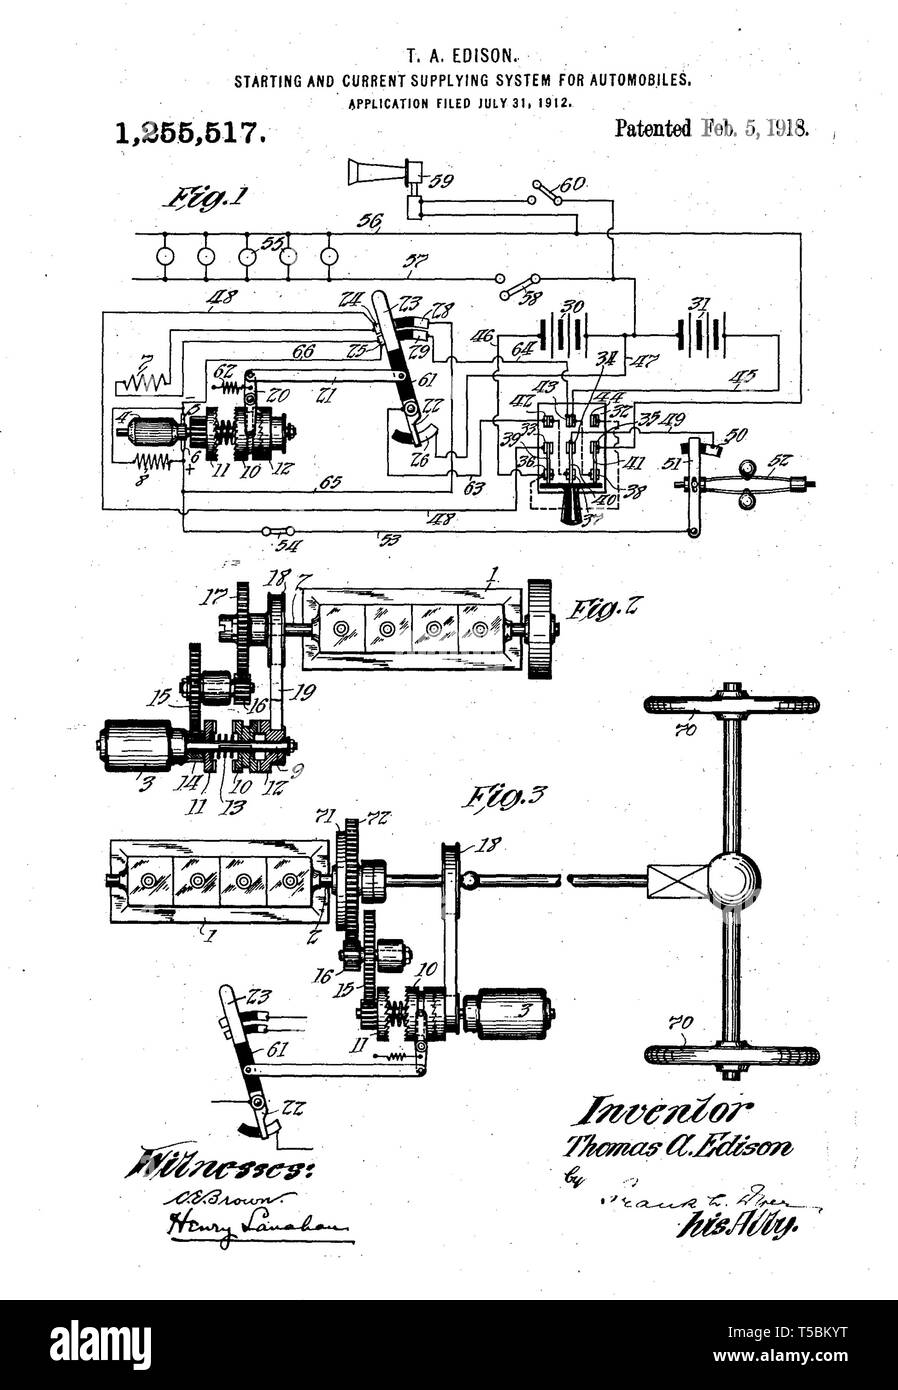 Thomas Edison, automobile starter motor invention, illustration, 1918 - Stock Image